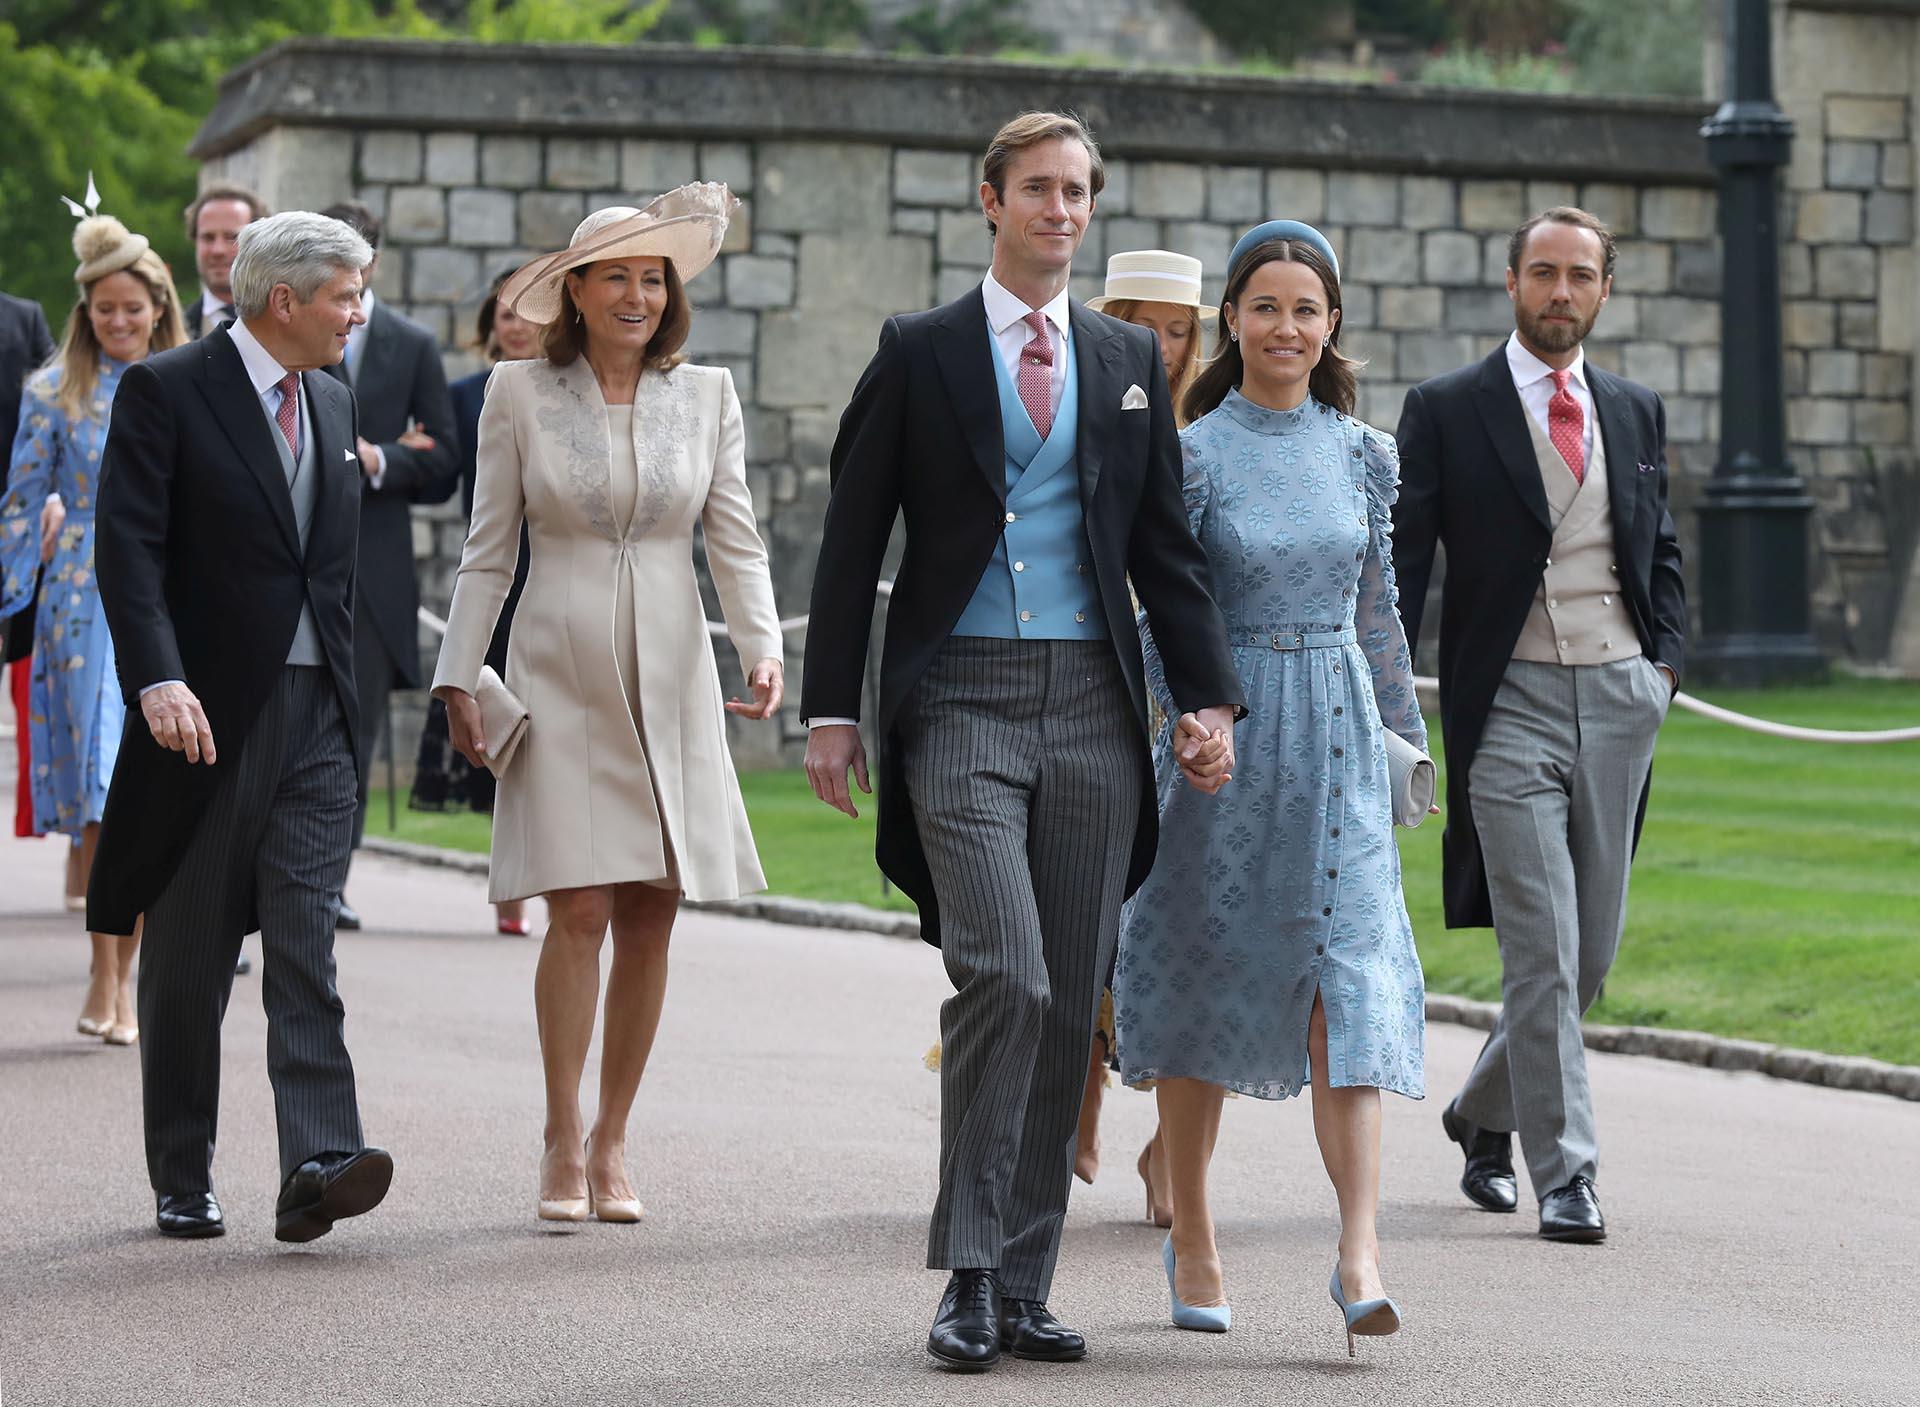 Michael y Carole Middleton, padres de Catalina de Cambridge, caminan detrás de James Matthews y Pippa Middleton